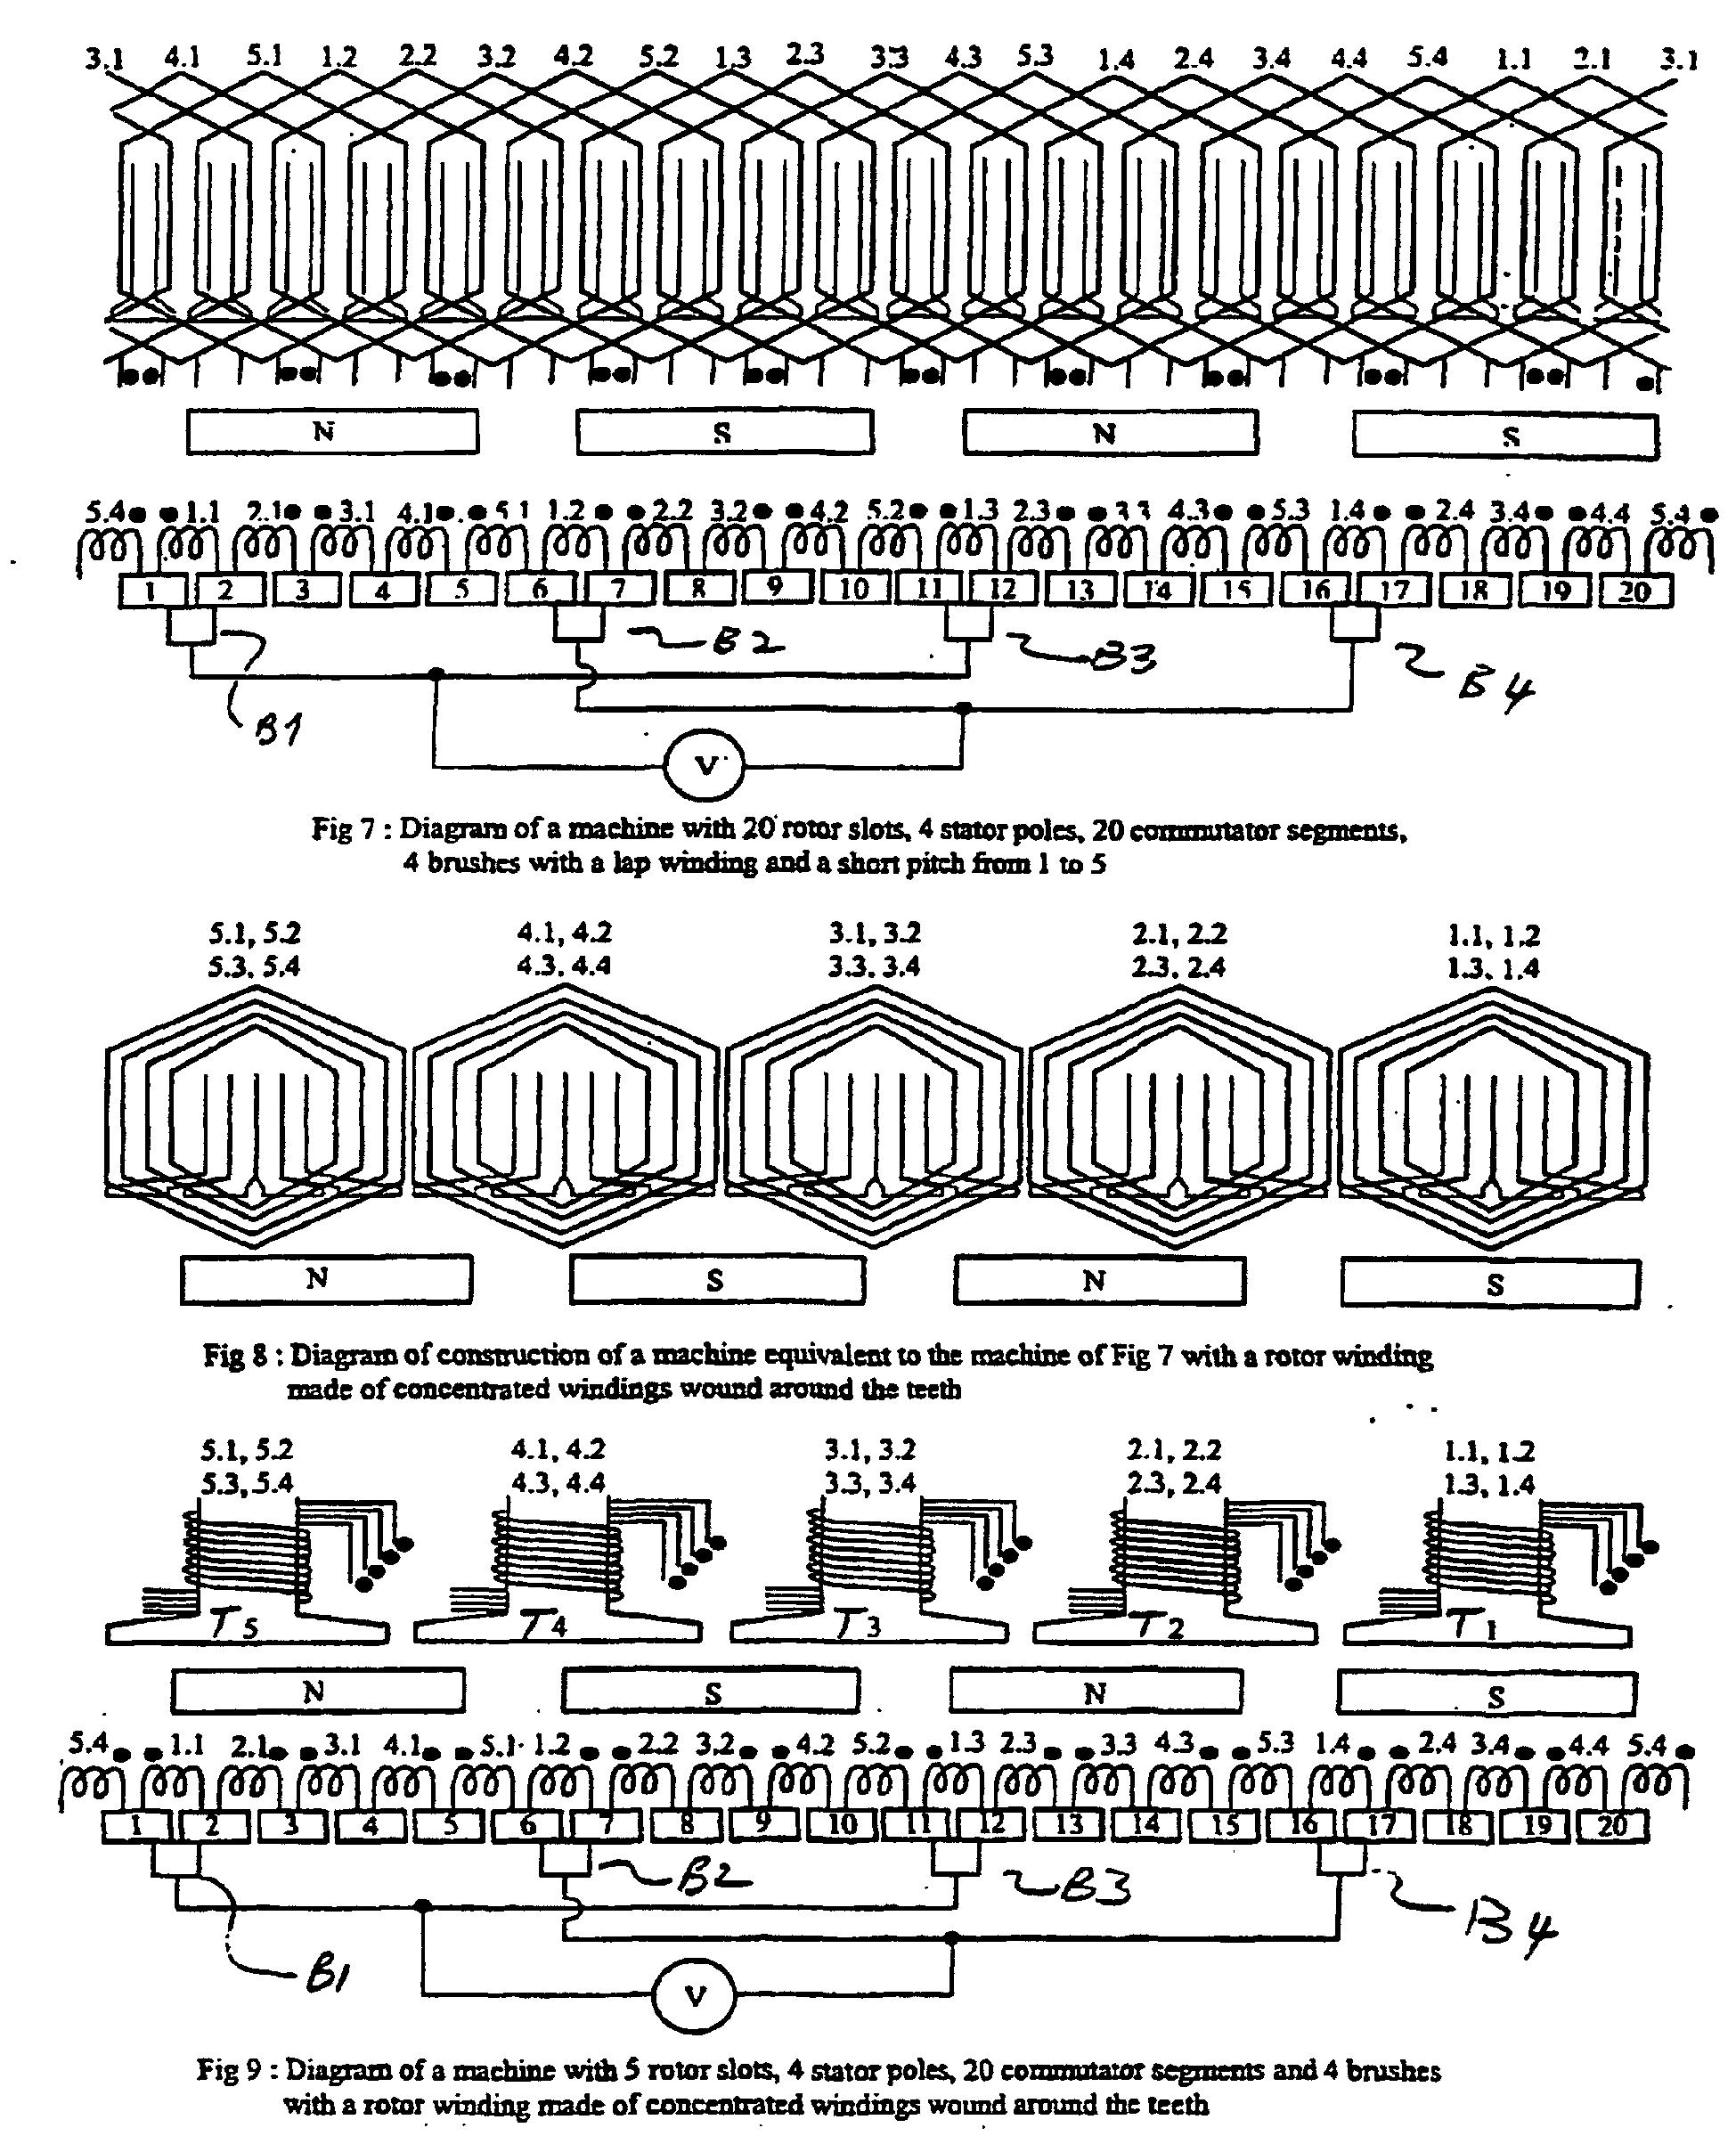 Generator Stator Winding Diagram Schematics Wiring Diagrams Ac Unit Schematic